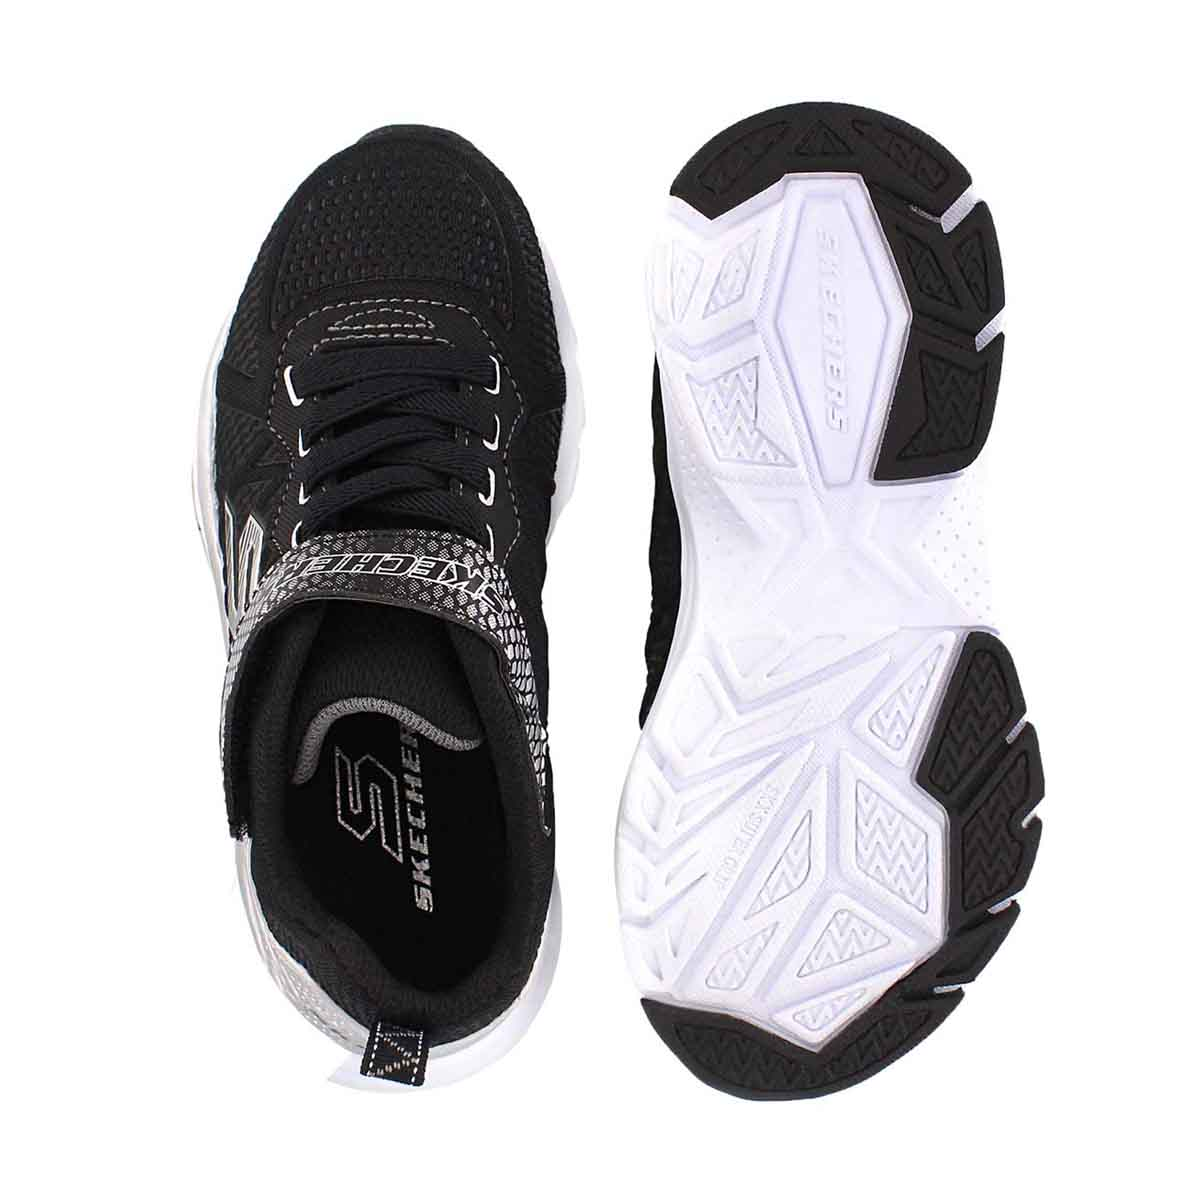 Bys Ultrasonix blk/sliver sneaker